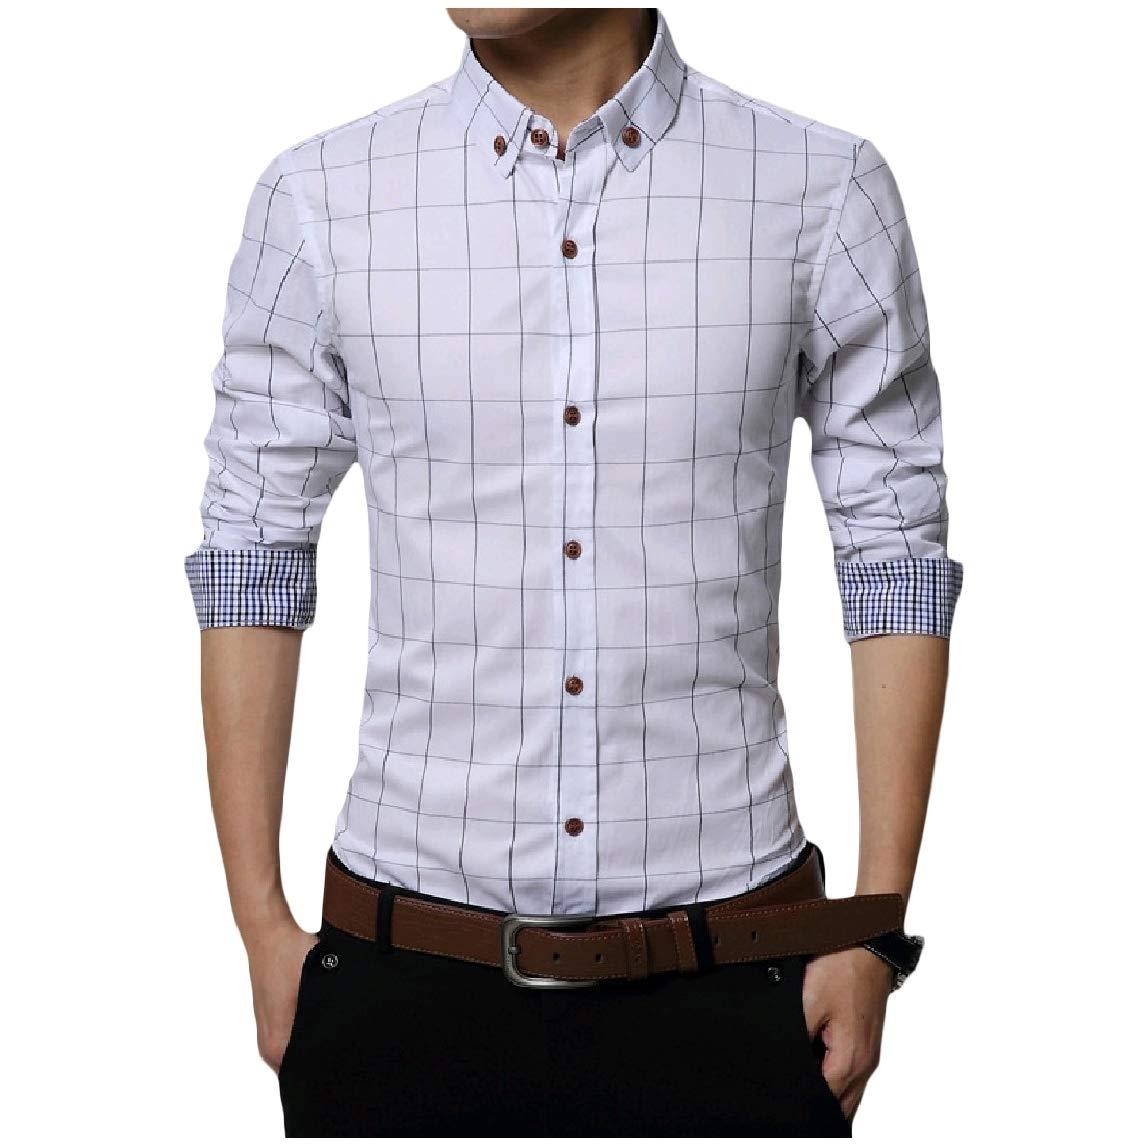 KaWaYi Mens Cotton Slim Plus Size Lapel Plaid Long-Sleeve Tees Top Shirts